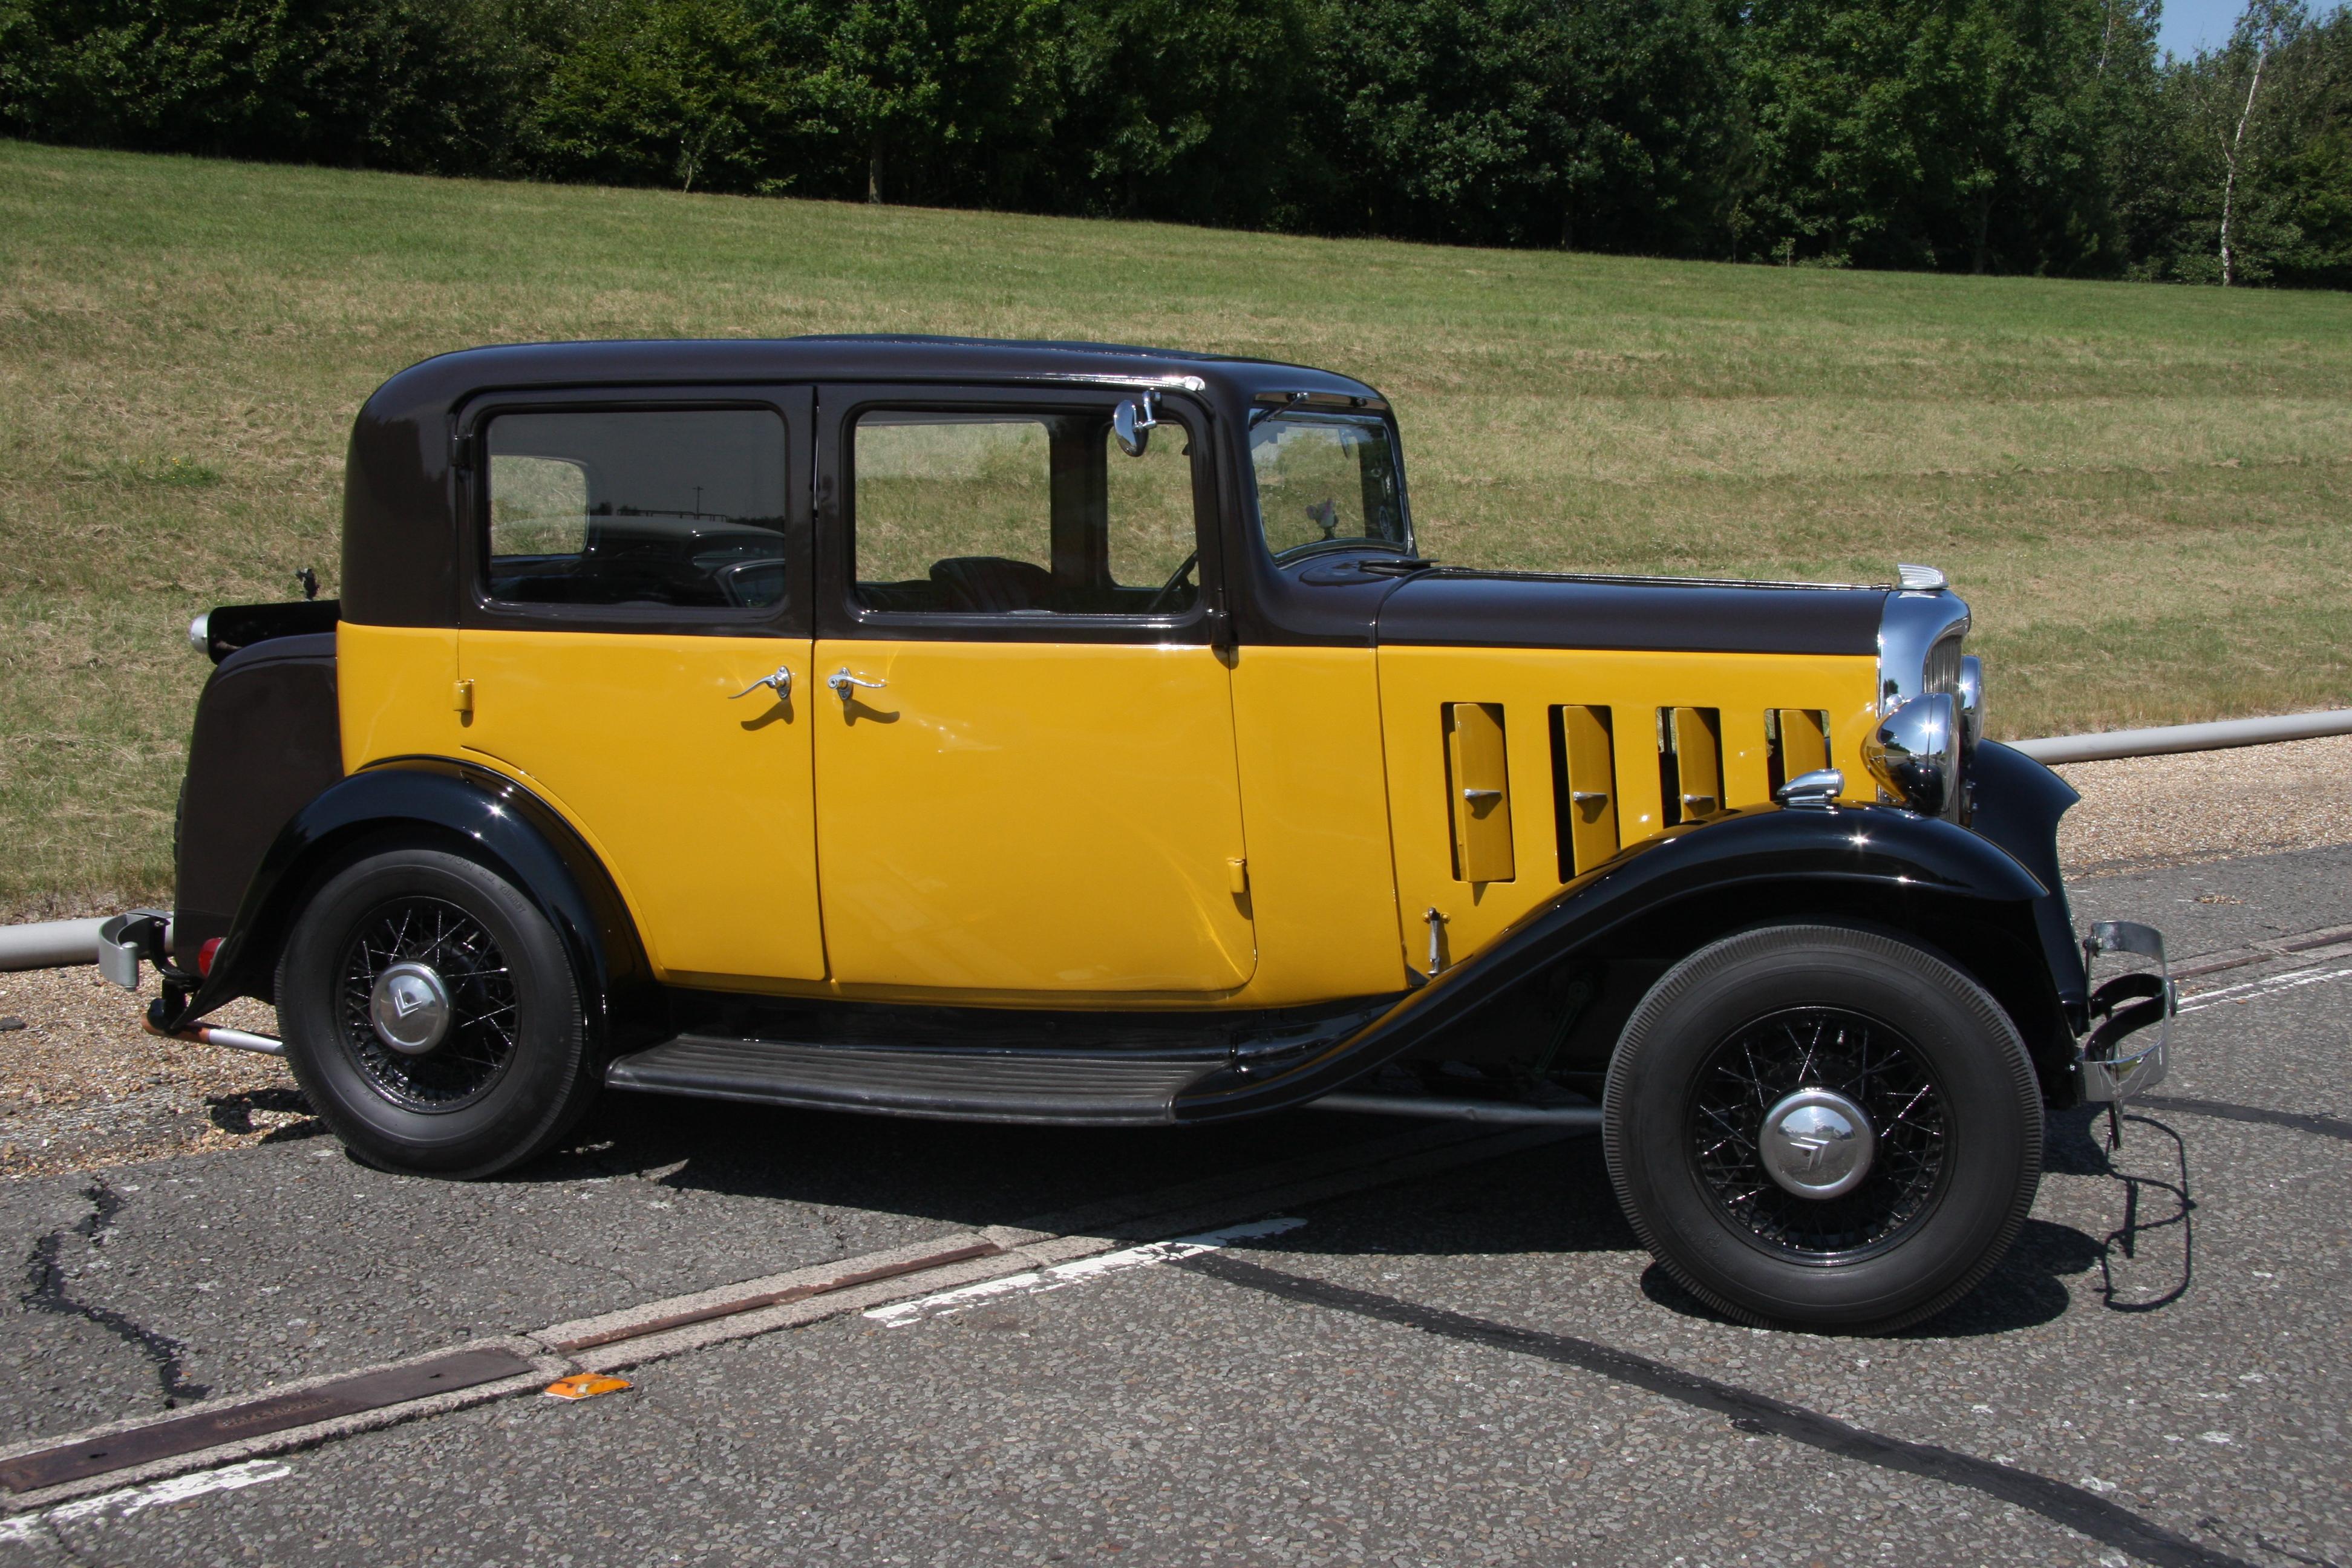 File:Citroën 10 Rosalie 1933.jpg - Wikimedia Commons